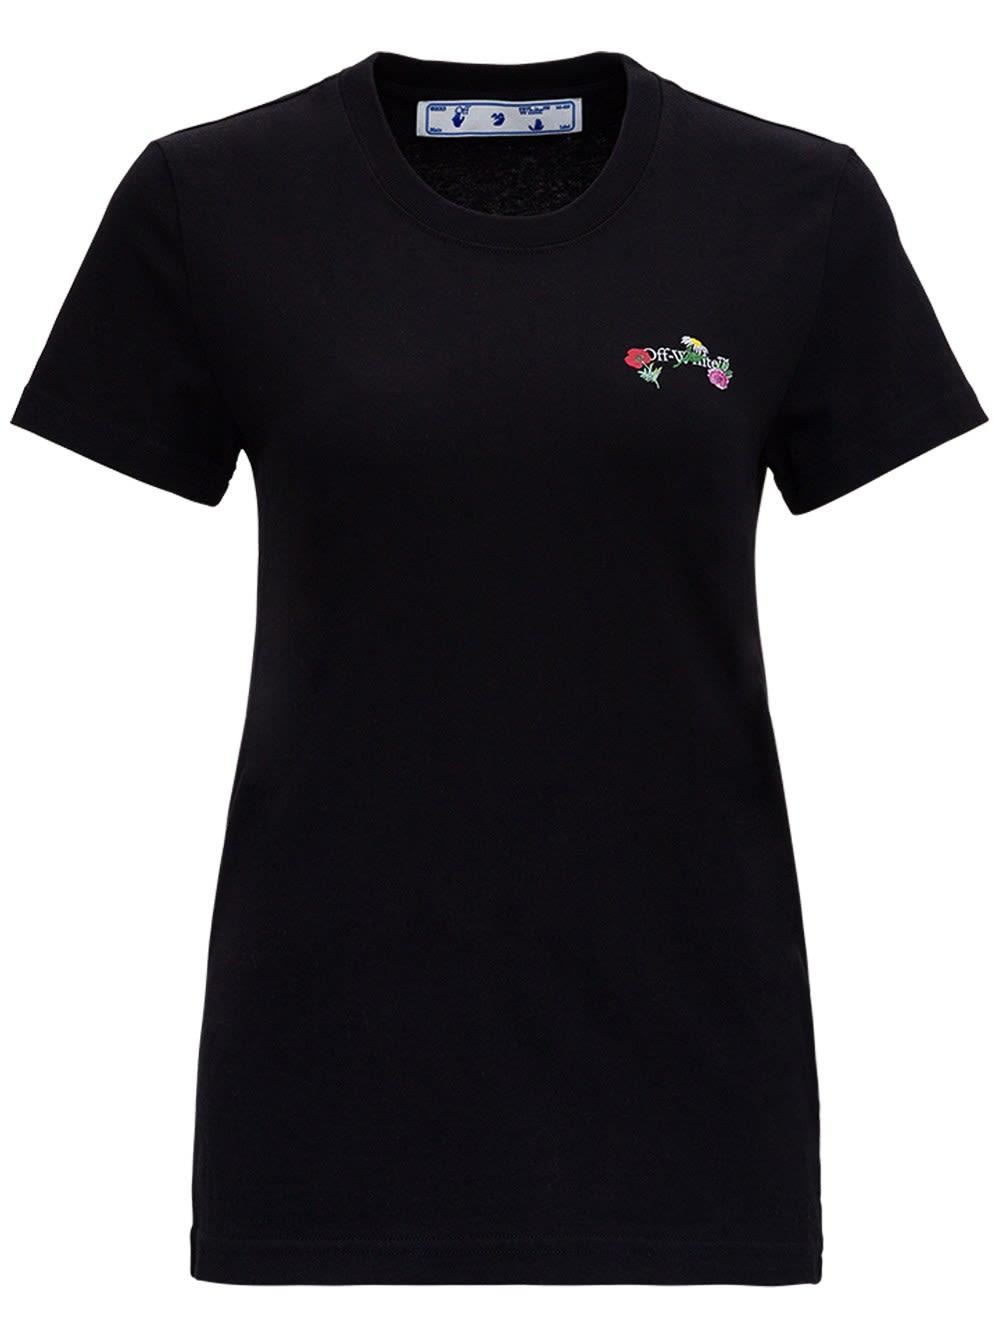 Off-White Arrows Flowers T-shirt In Black Jersey